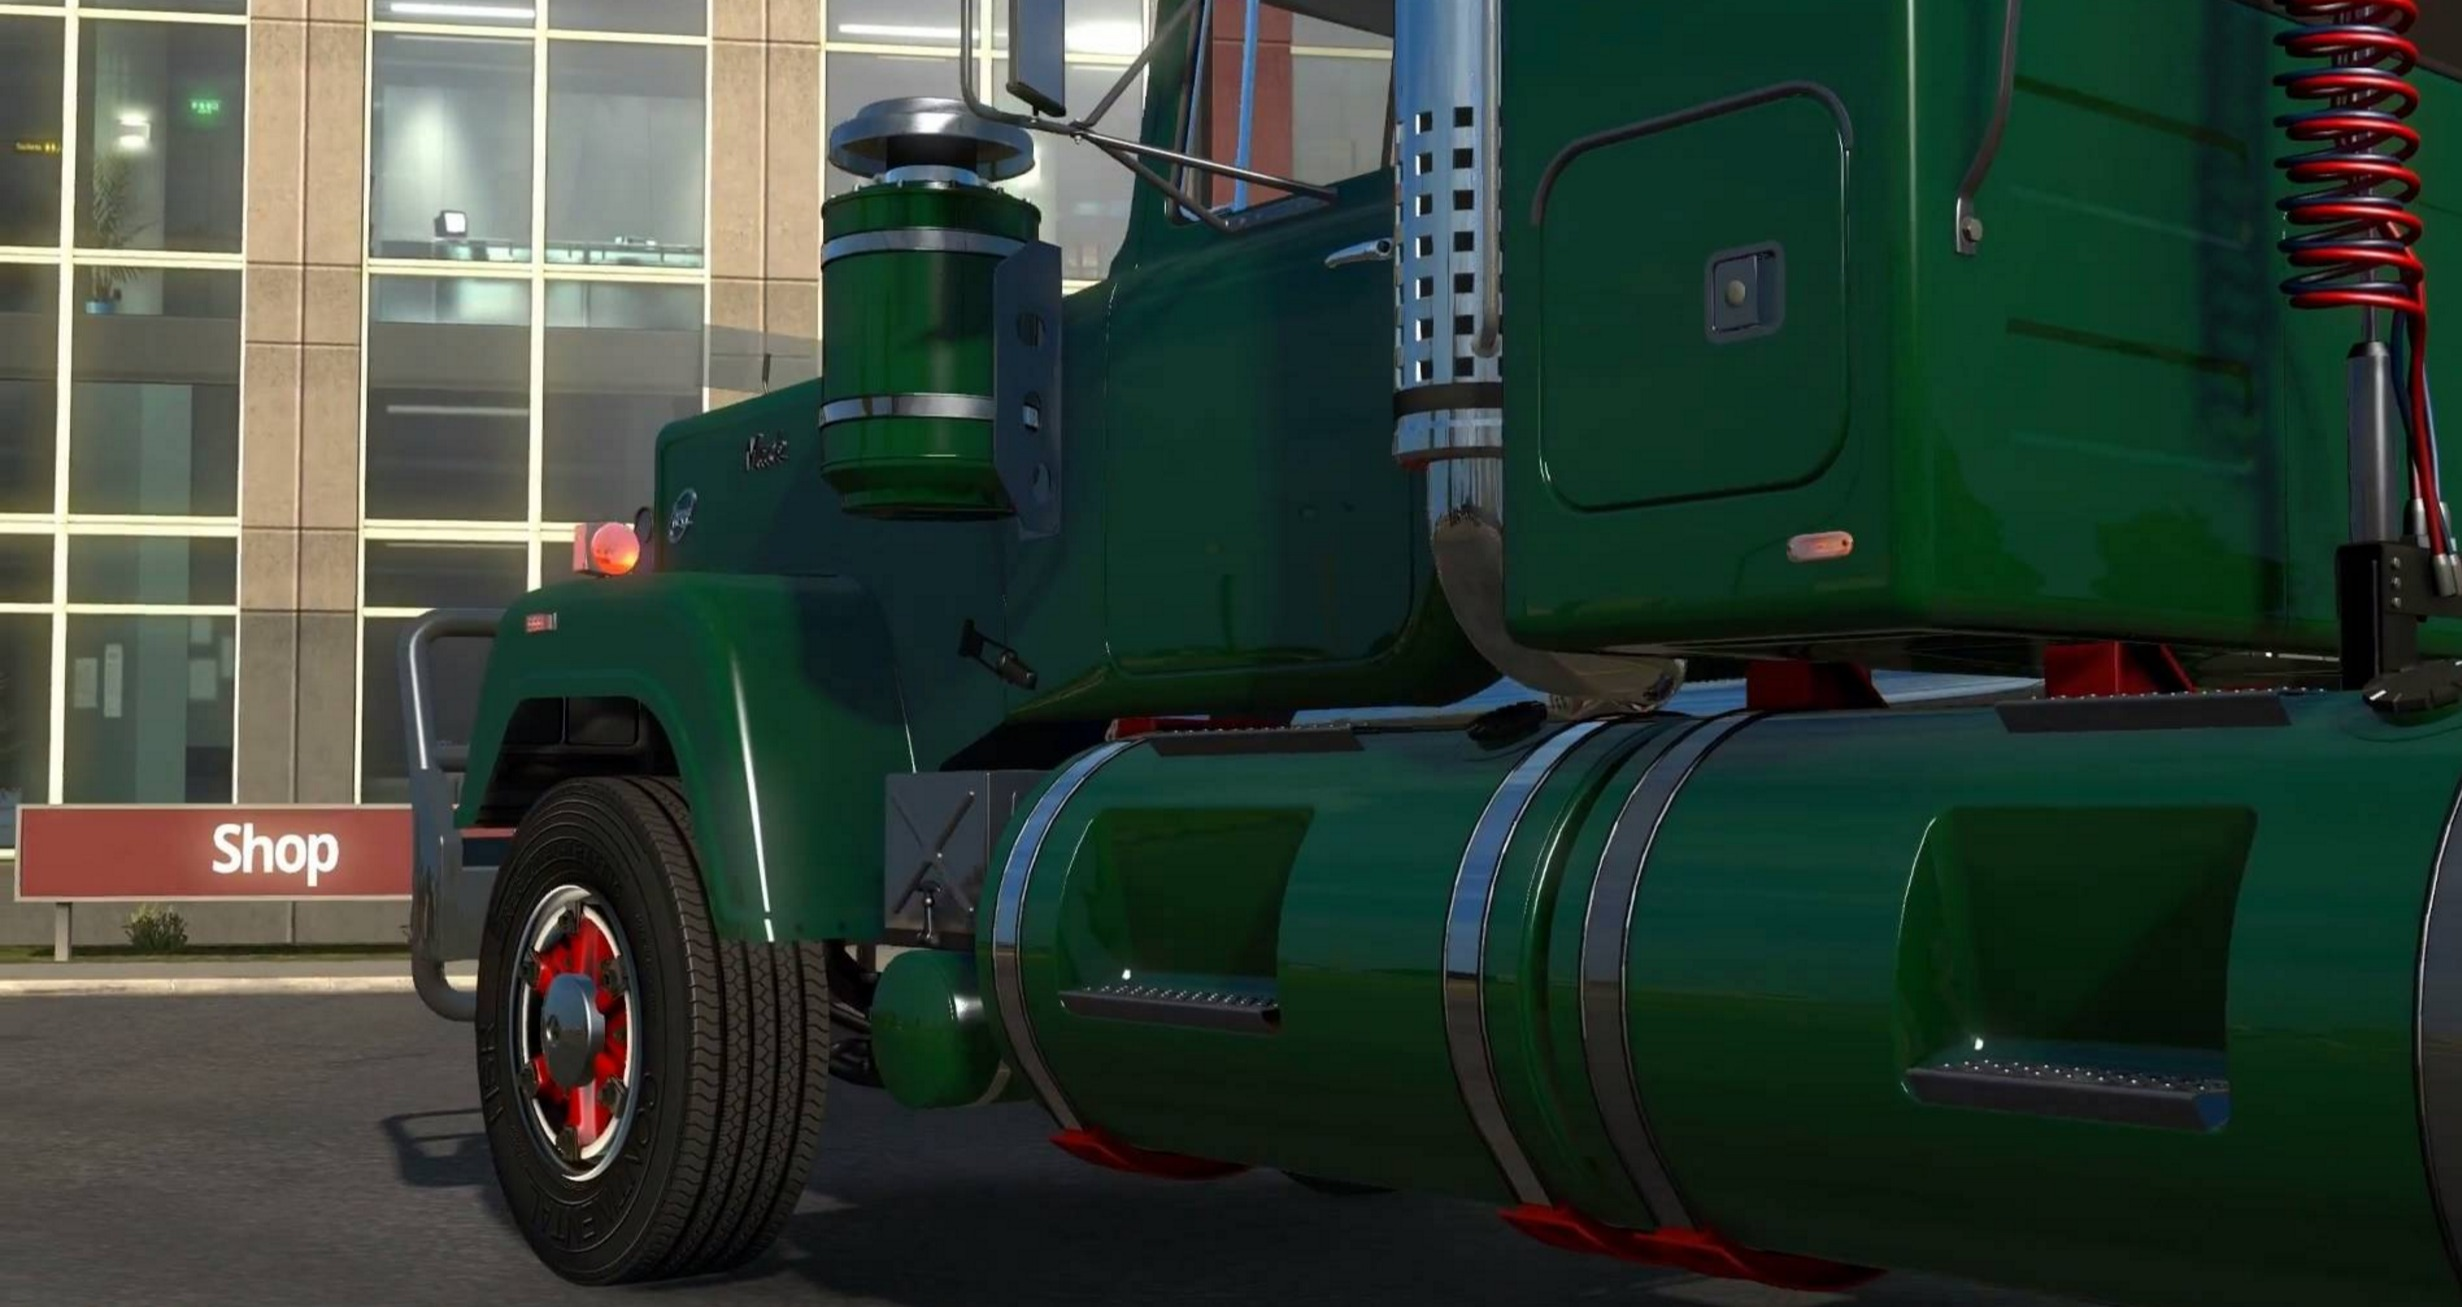 Mack Superliner for Mod - ATS mod / American Truck Simulator mod